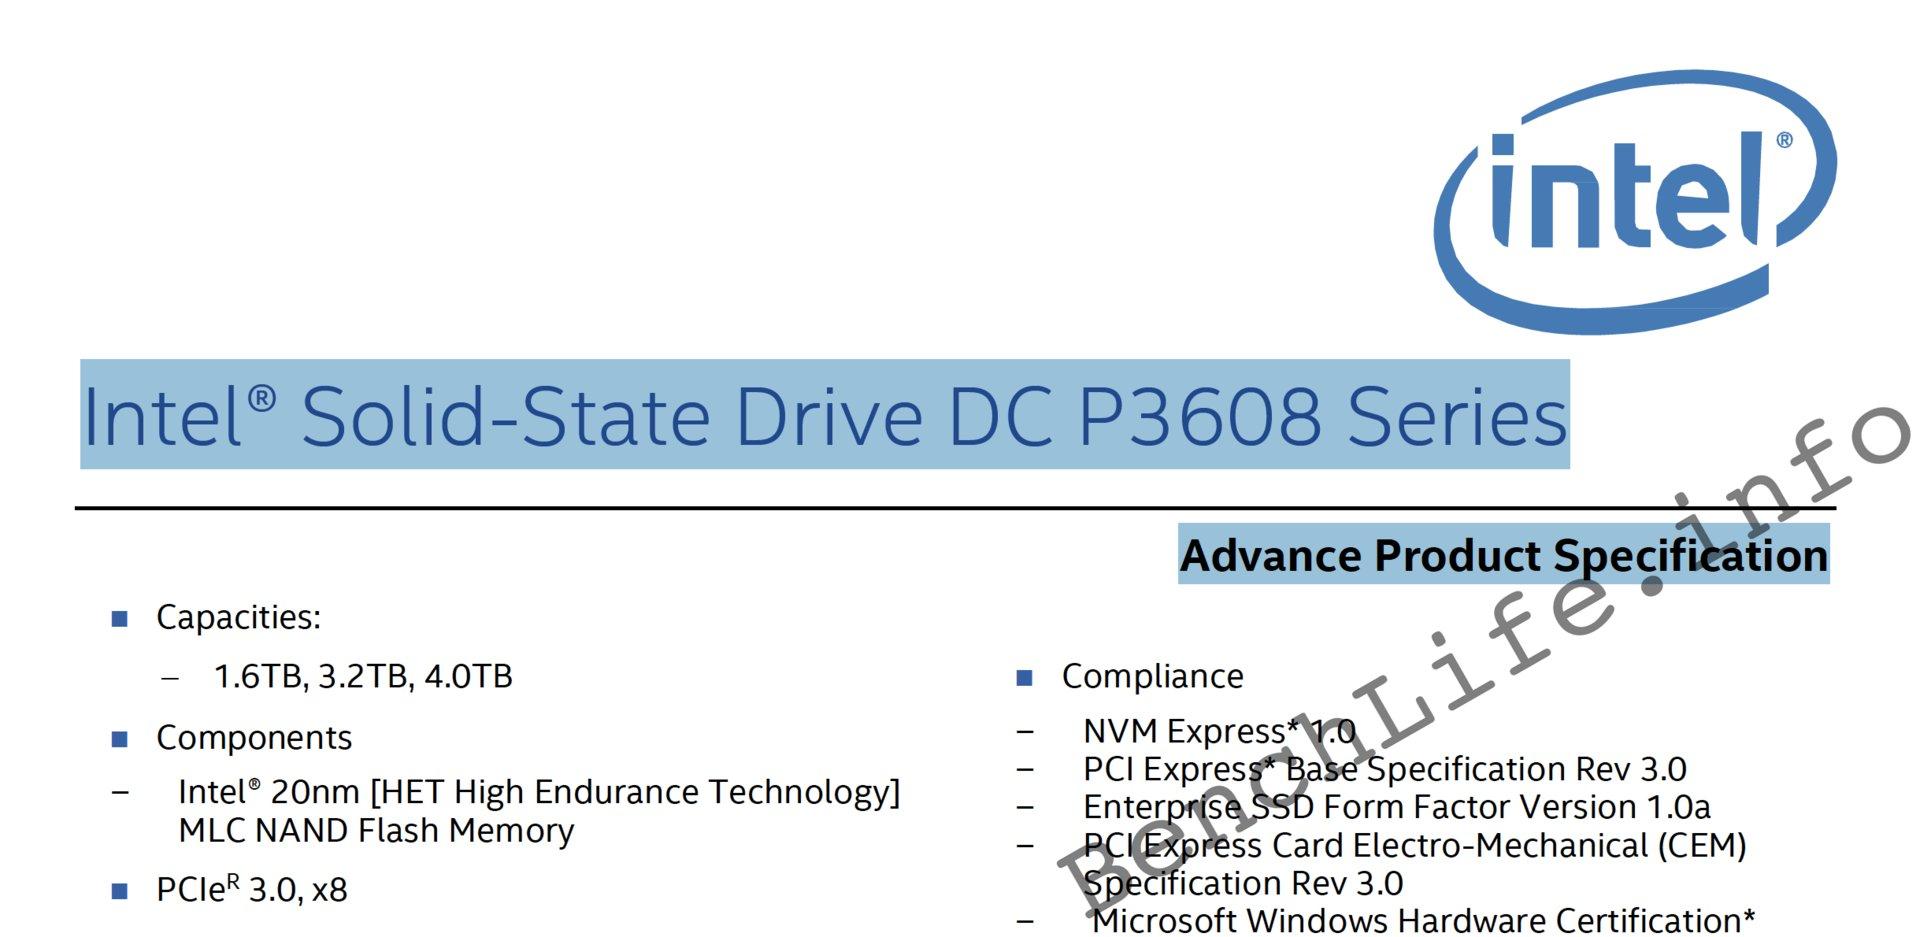 Intel SSD DC P3608